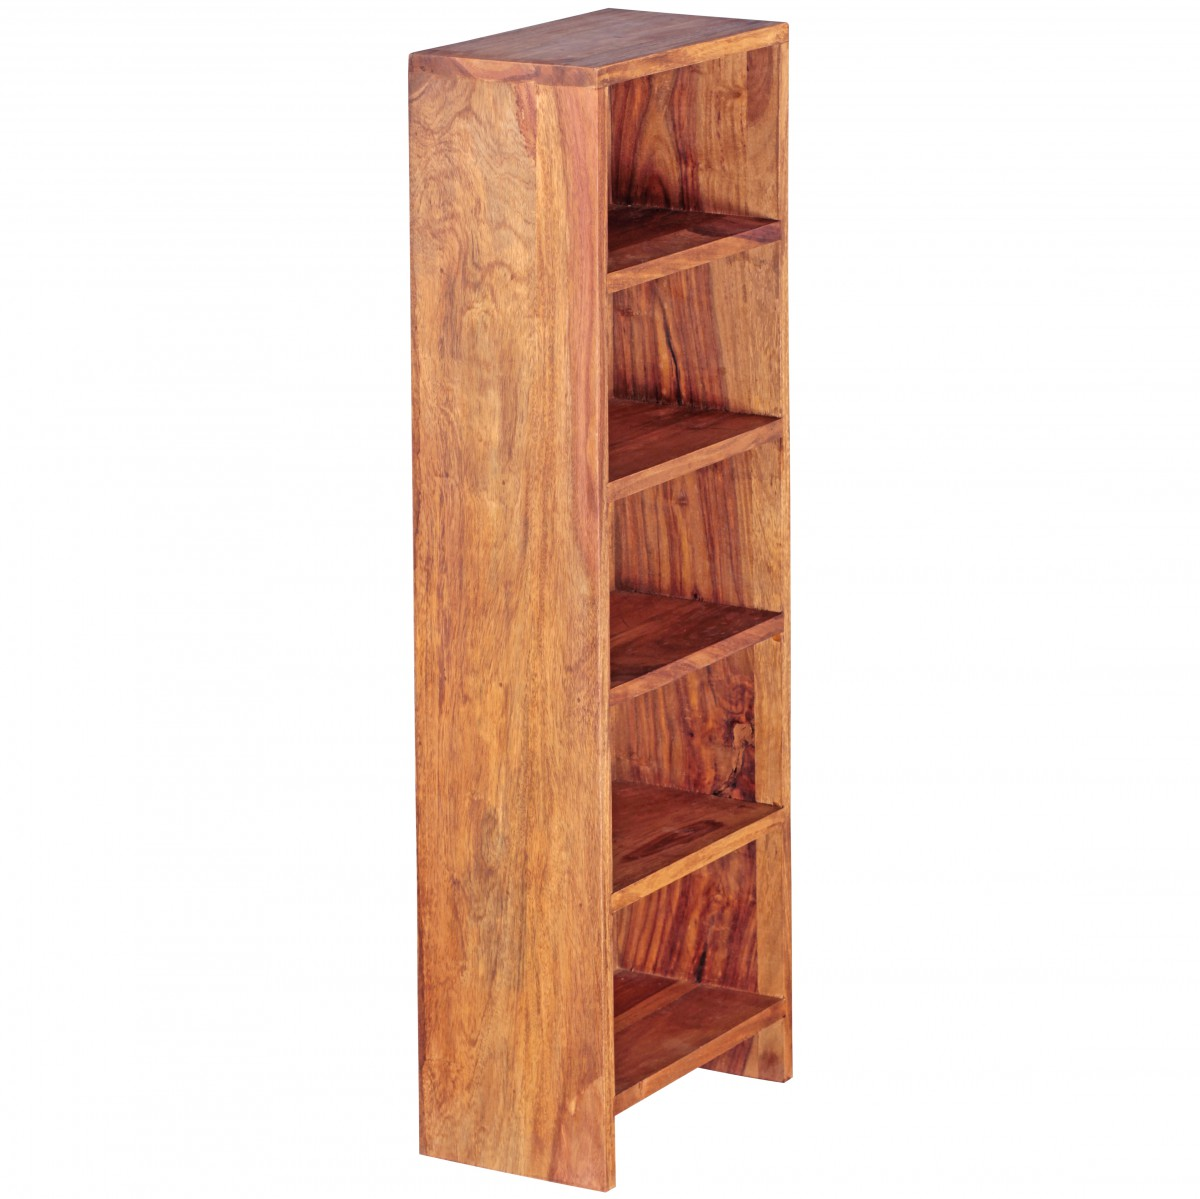 wohnling cd regal massivholz sheesham standregal 90cm hoch aufbewahrung 5 f cher ebay. Black Bedroom Furniture Sets. Home Design Ideas